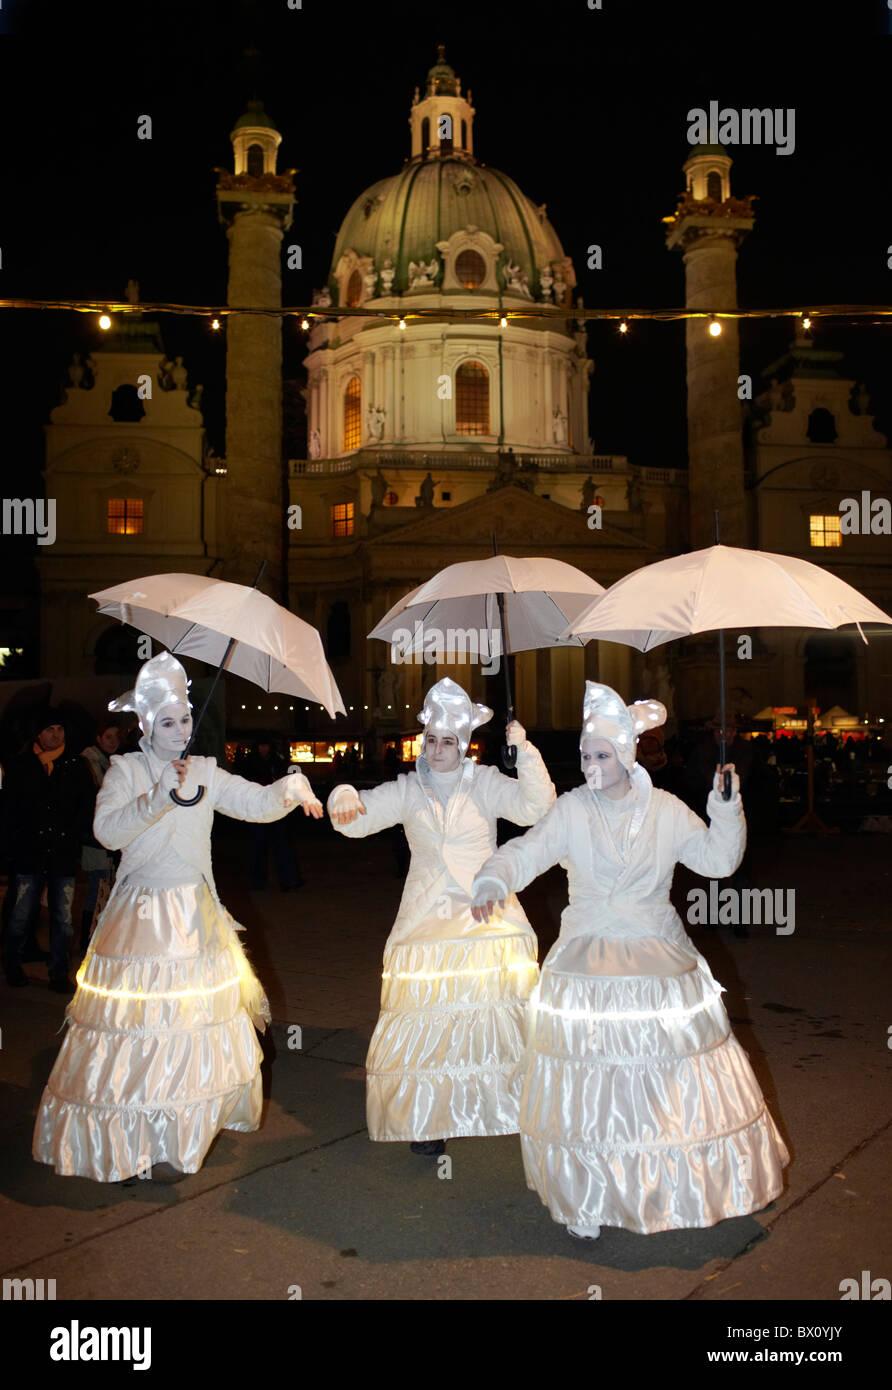 3 women dressed in white outfit Karlsplatz Christmas market - Stock Image